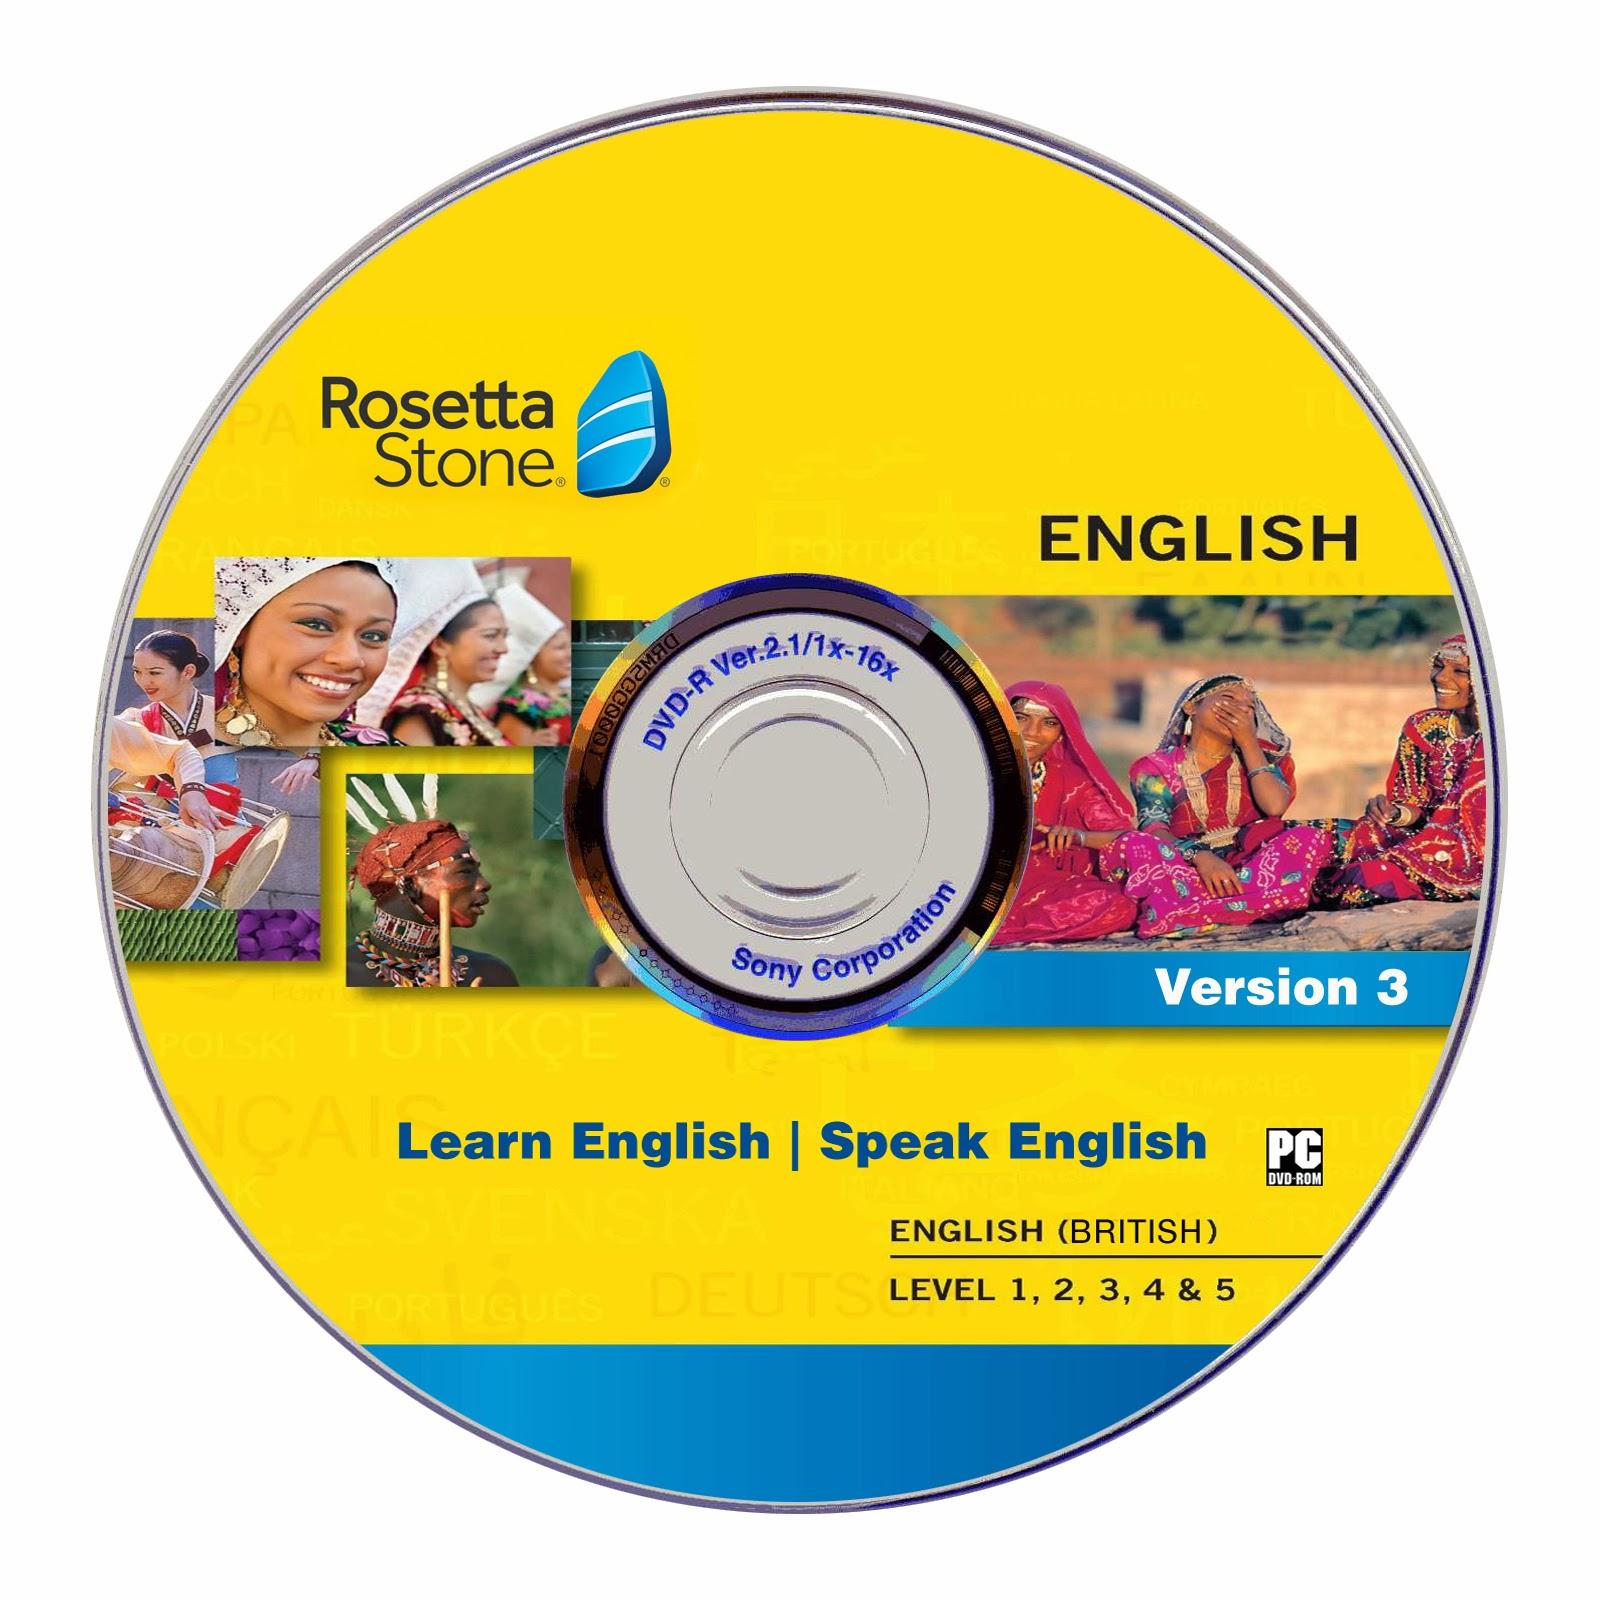 Easy Learning Dvds Rosetta Stone English British Levels 1